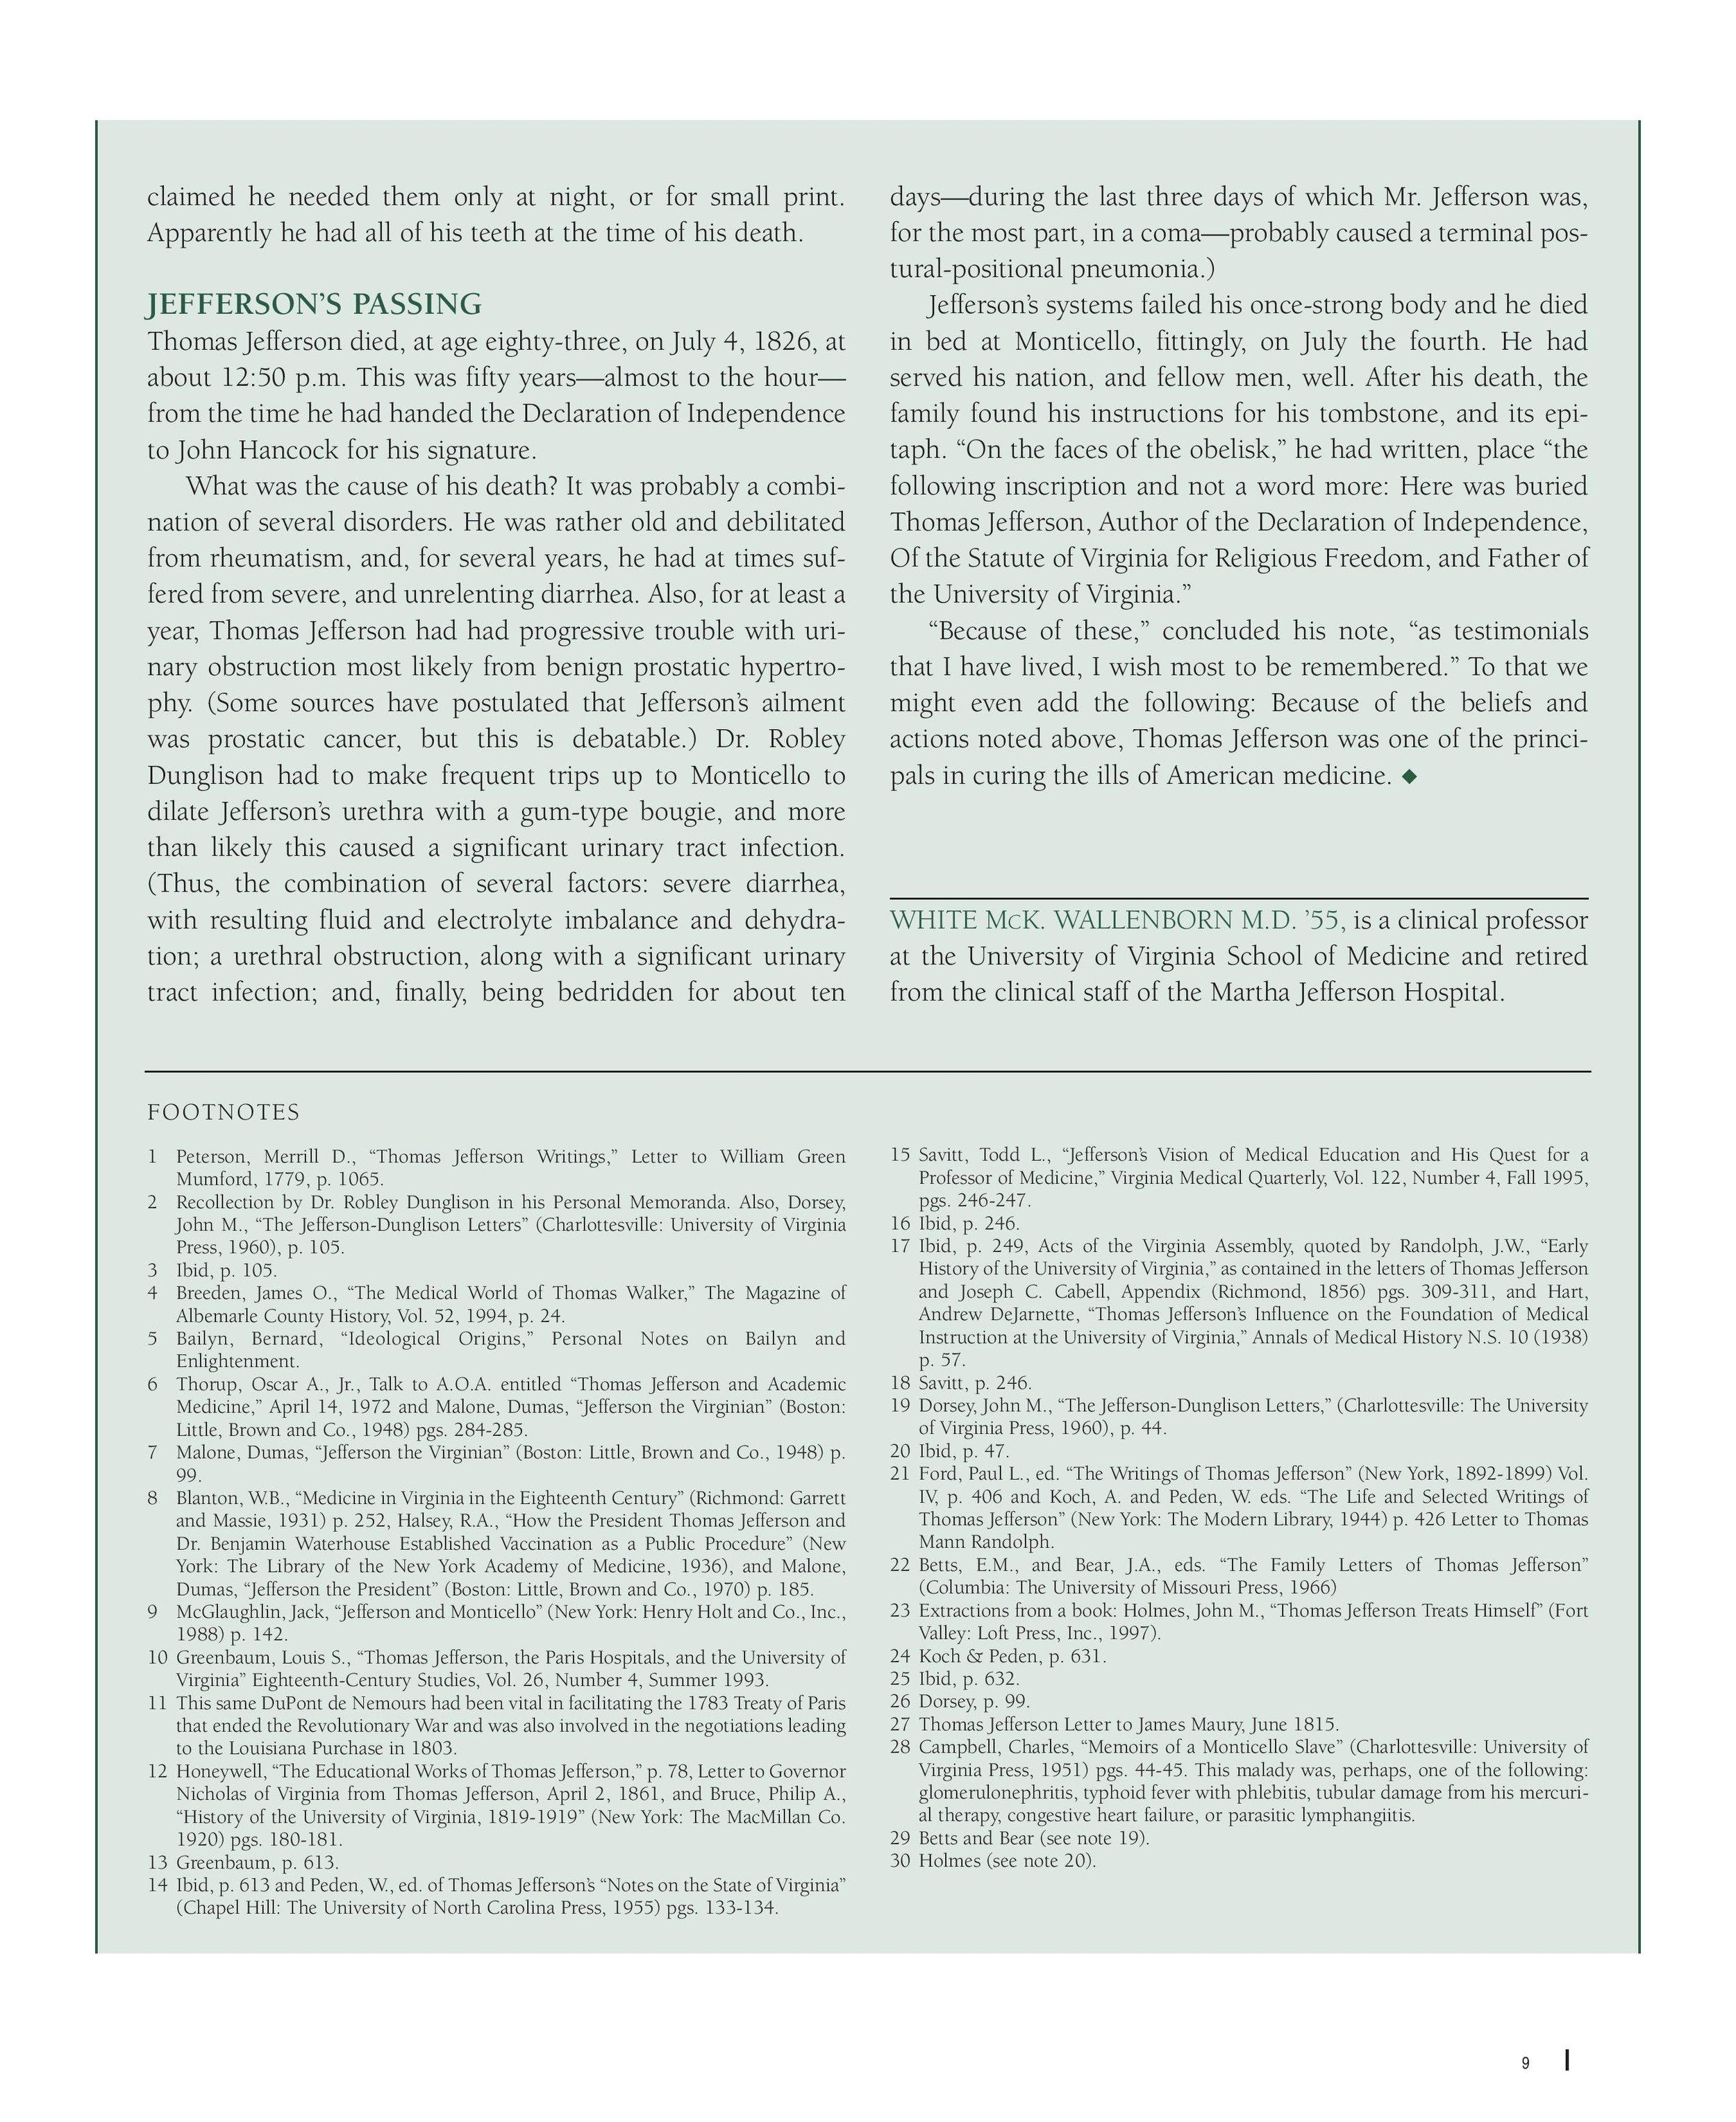 Jefferson_and_medicine-page-007.jpg